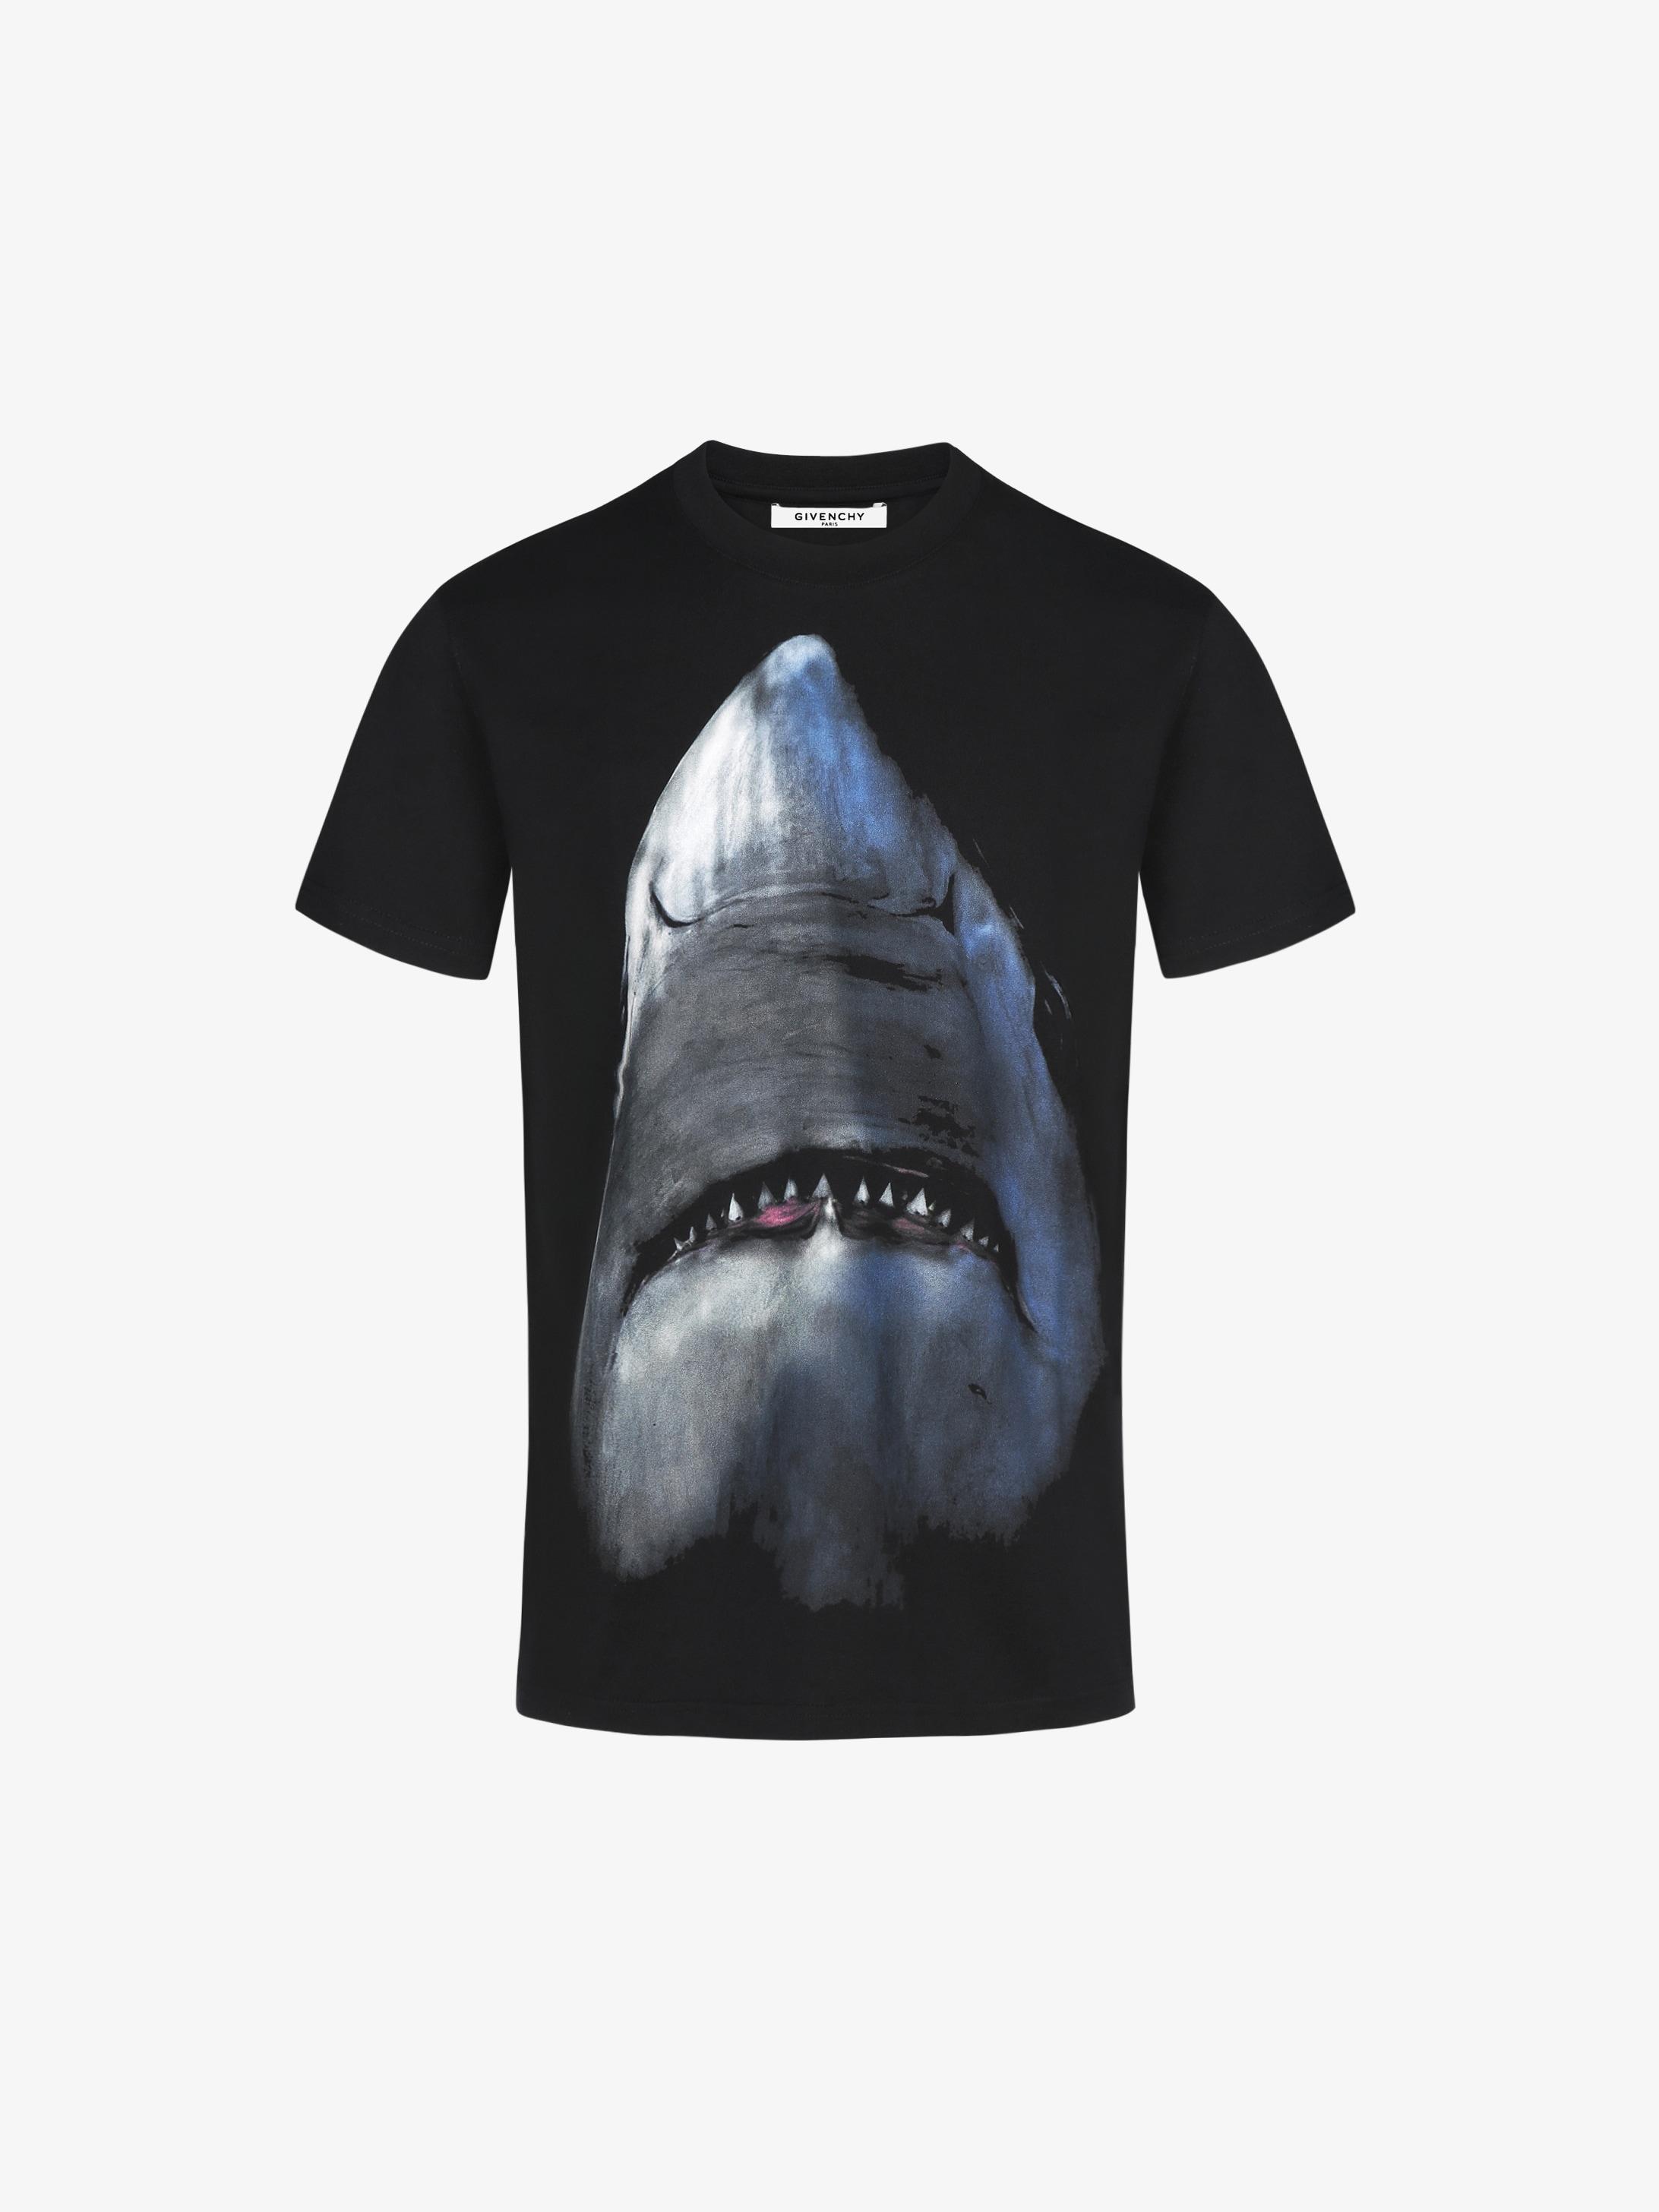 Givenchy Shark printed t-shirt  cef0ffc4b4